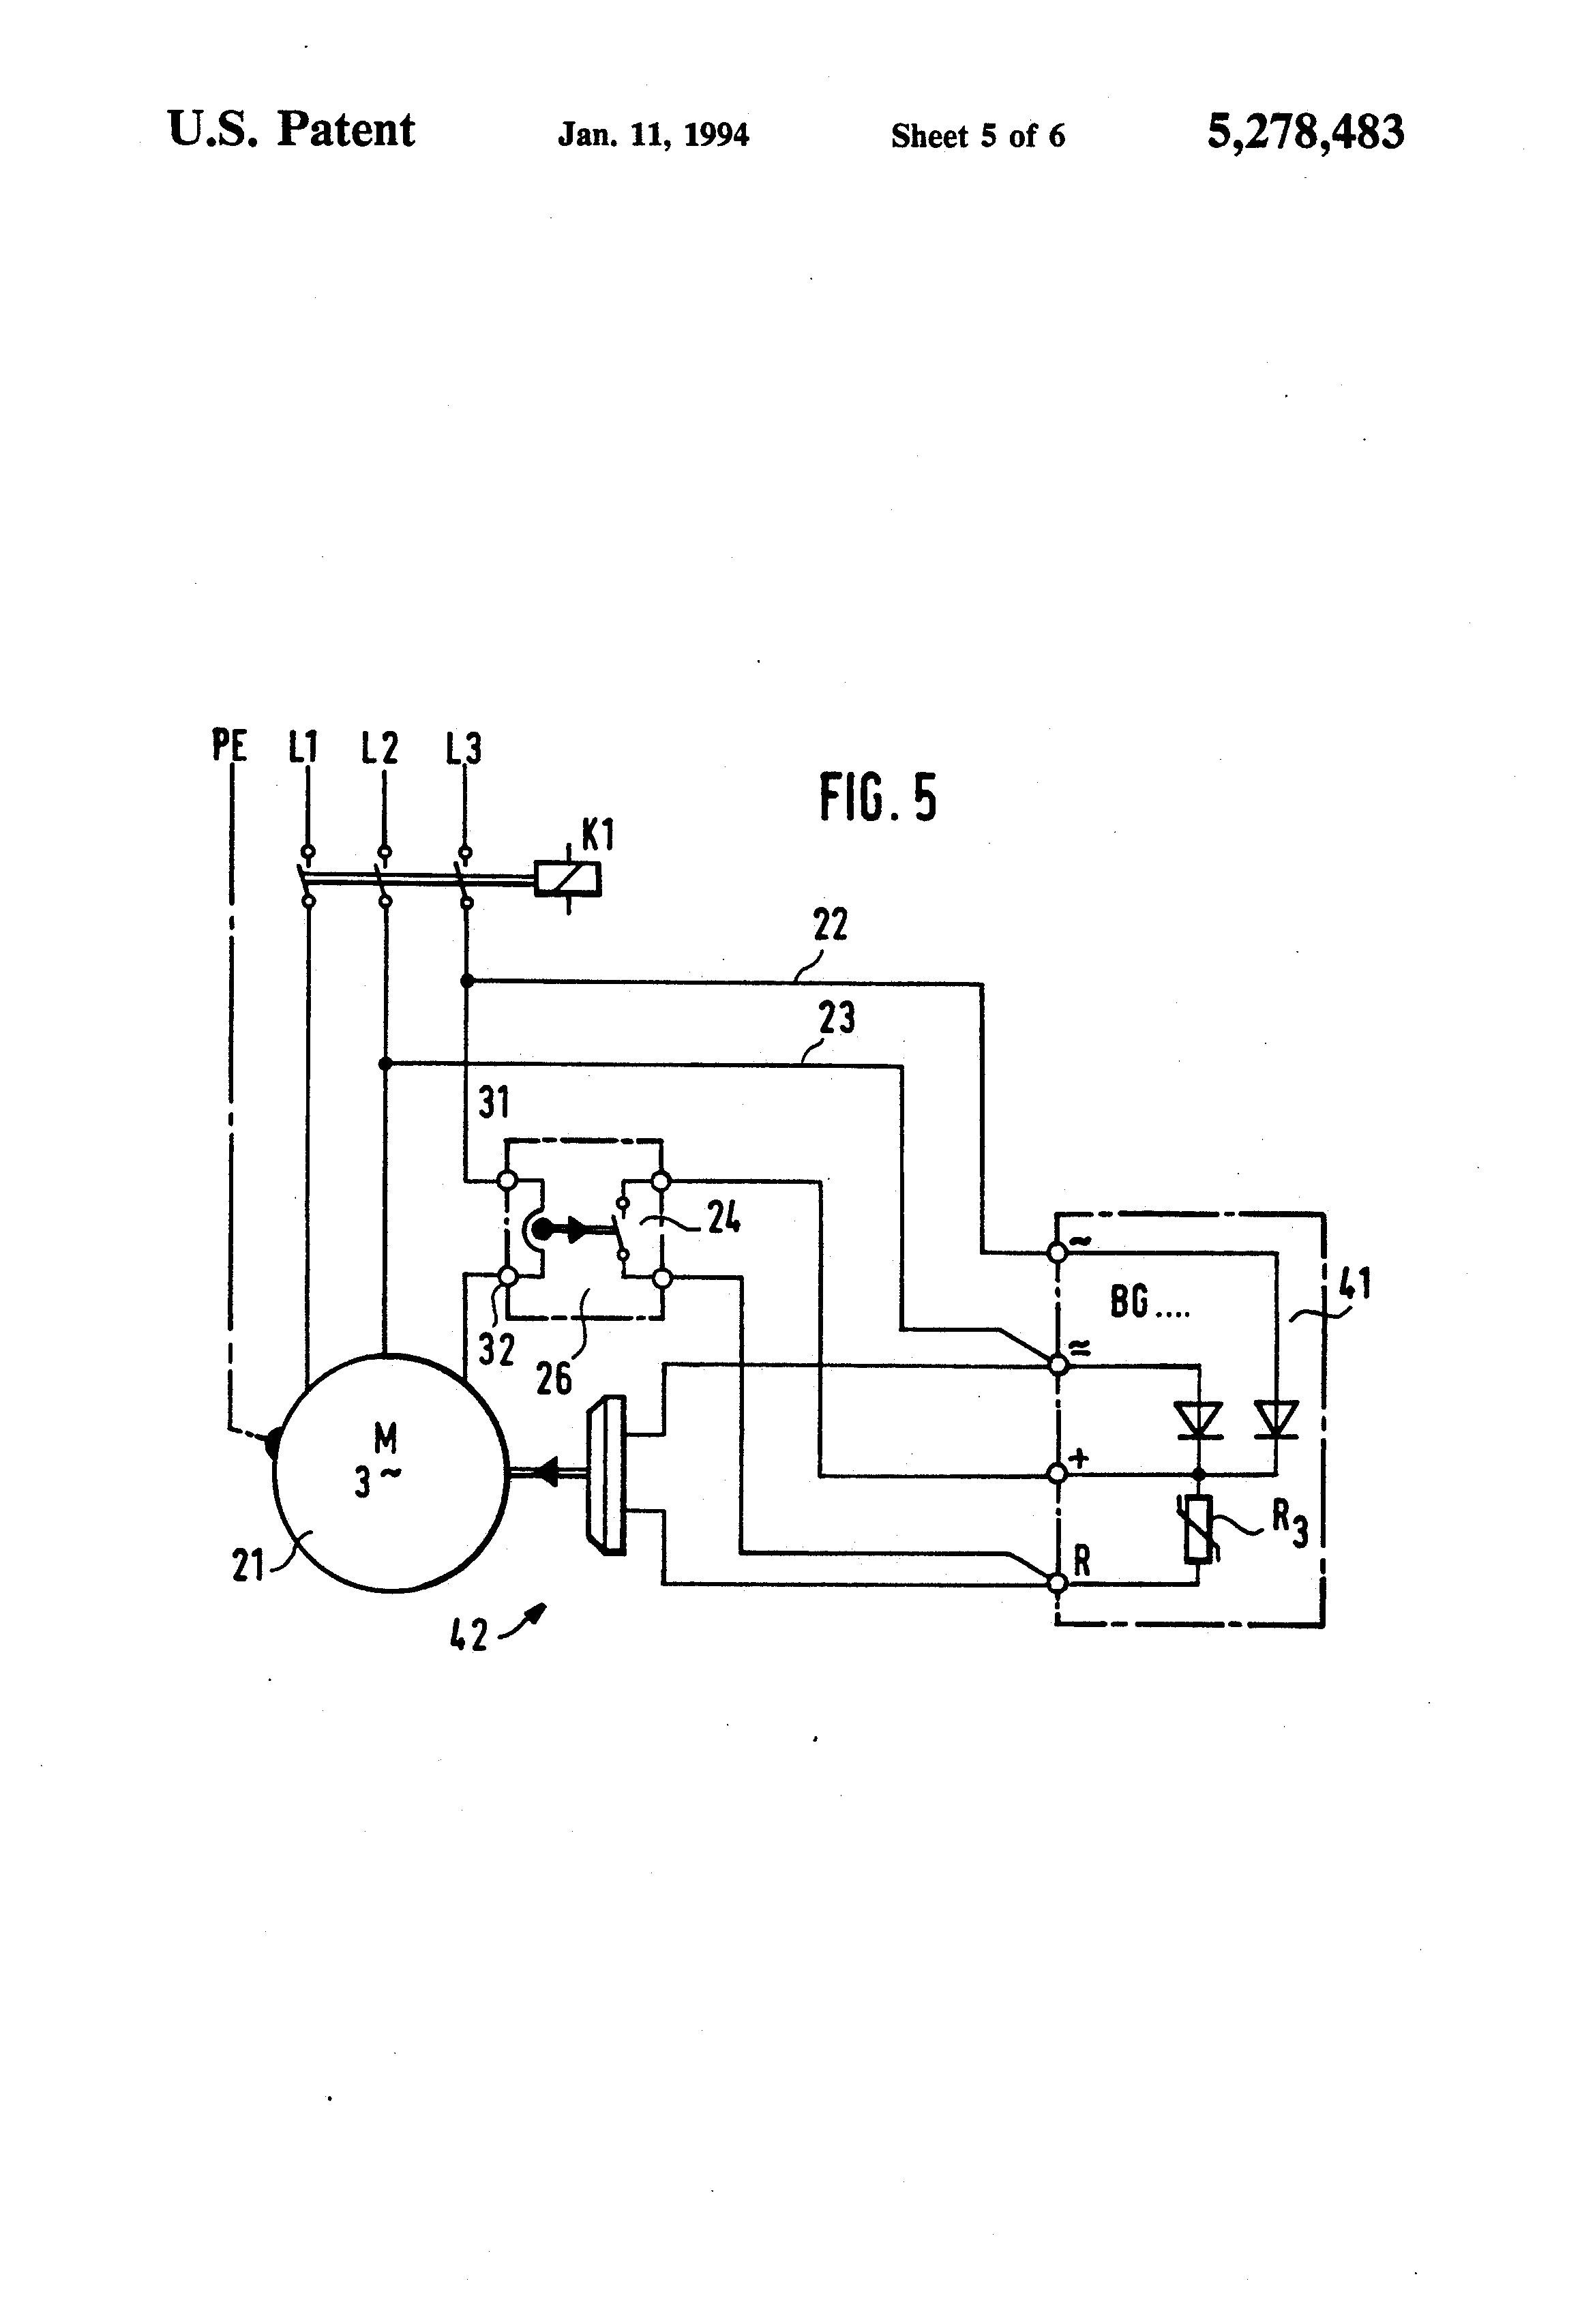 sew motor wiring wiring diagrams terms sew eurodrive motor wiring diagram sew eurodrive motor wiring diagram